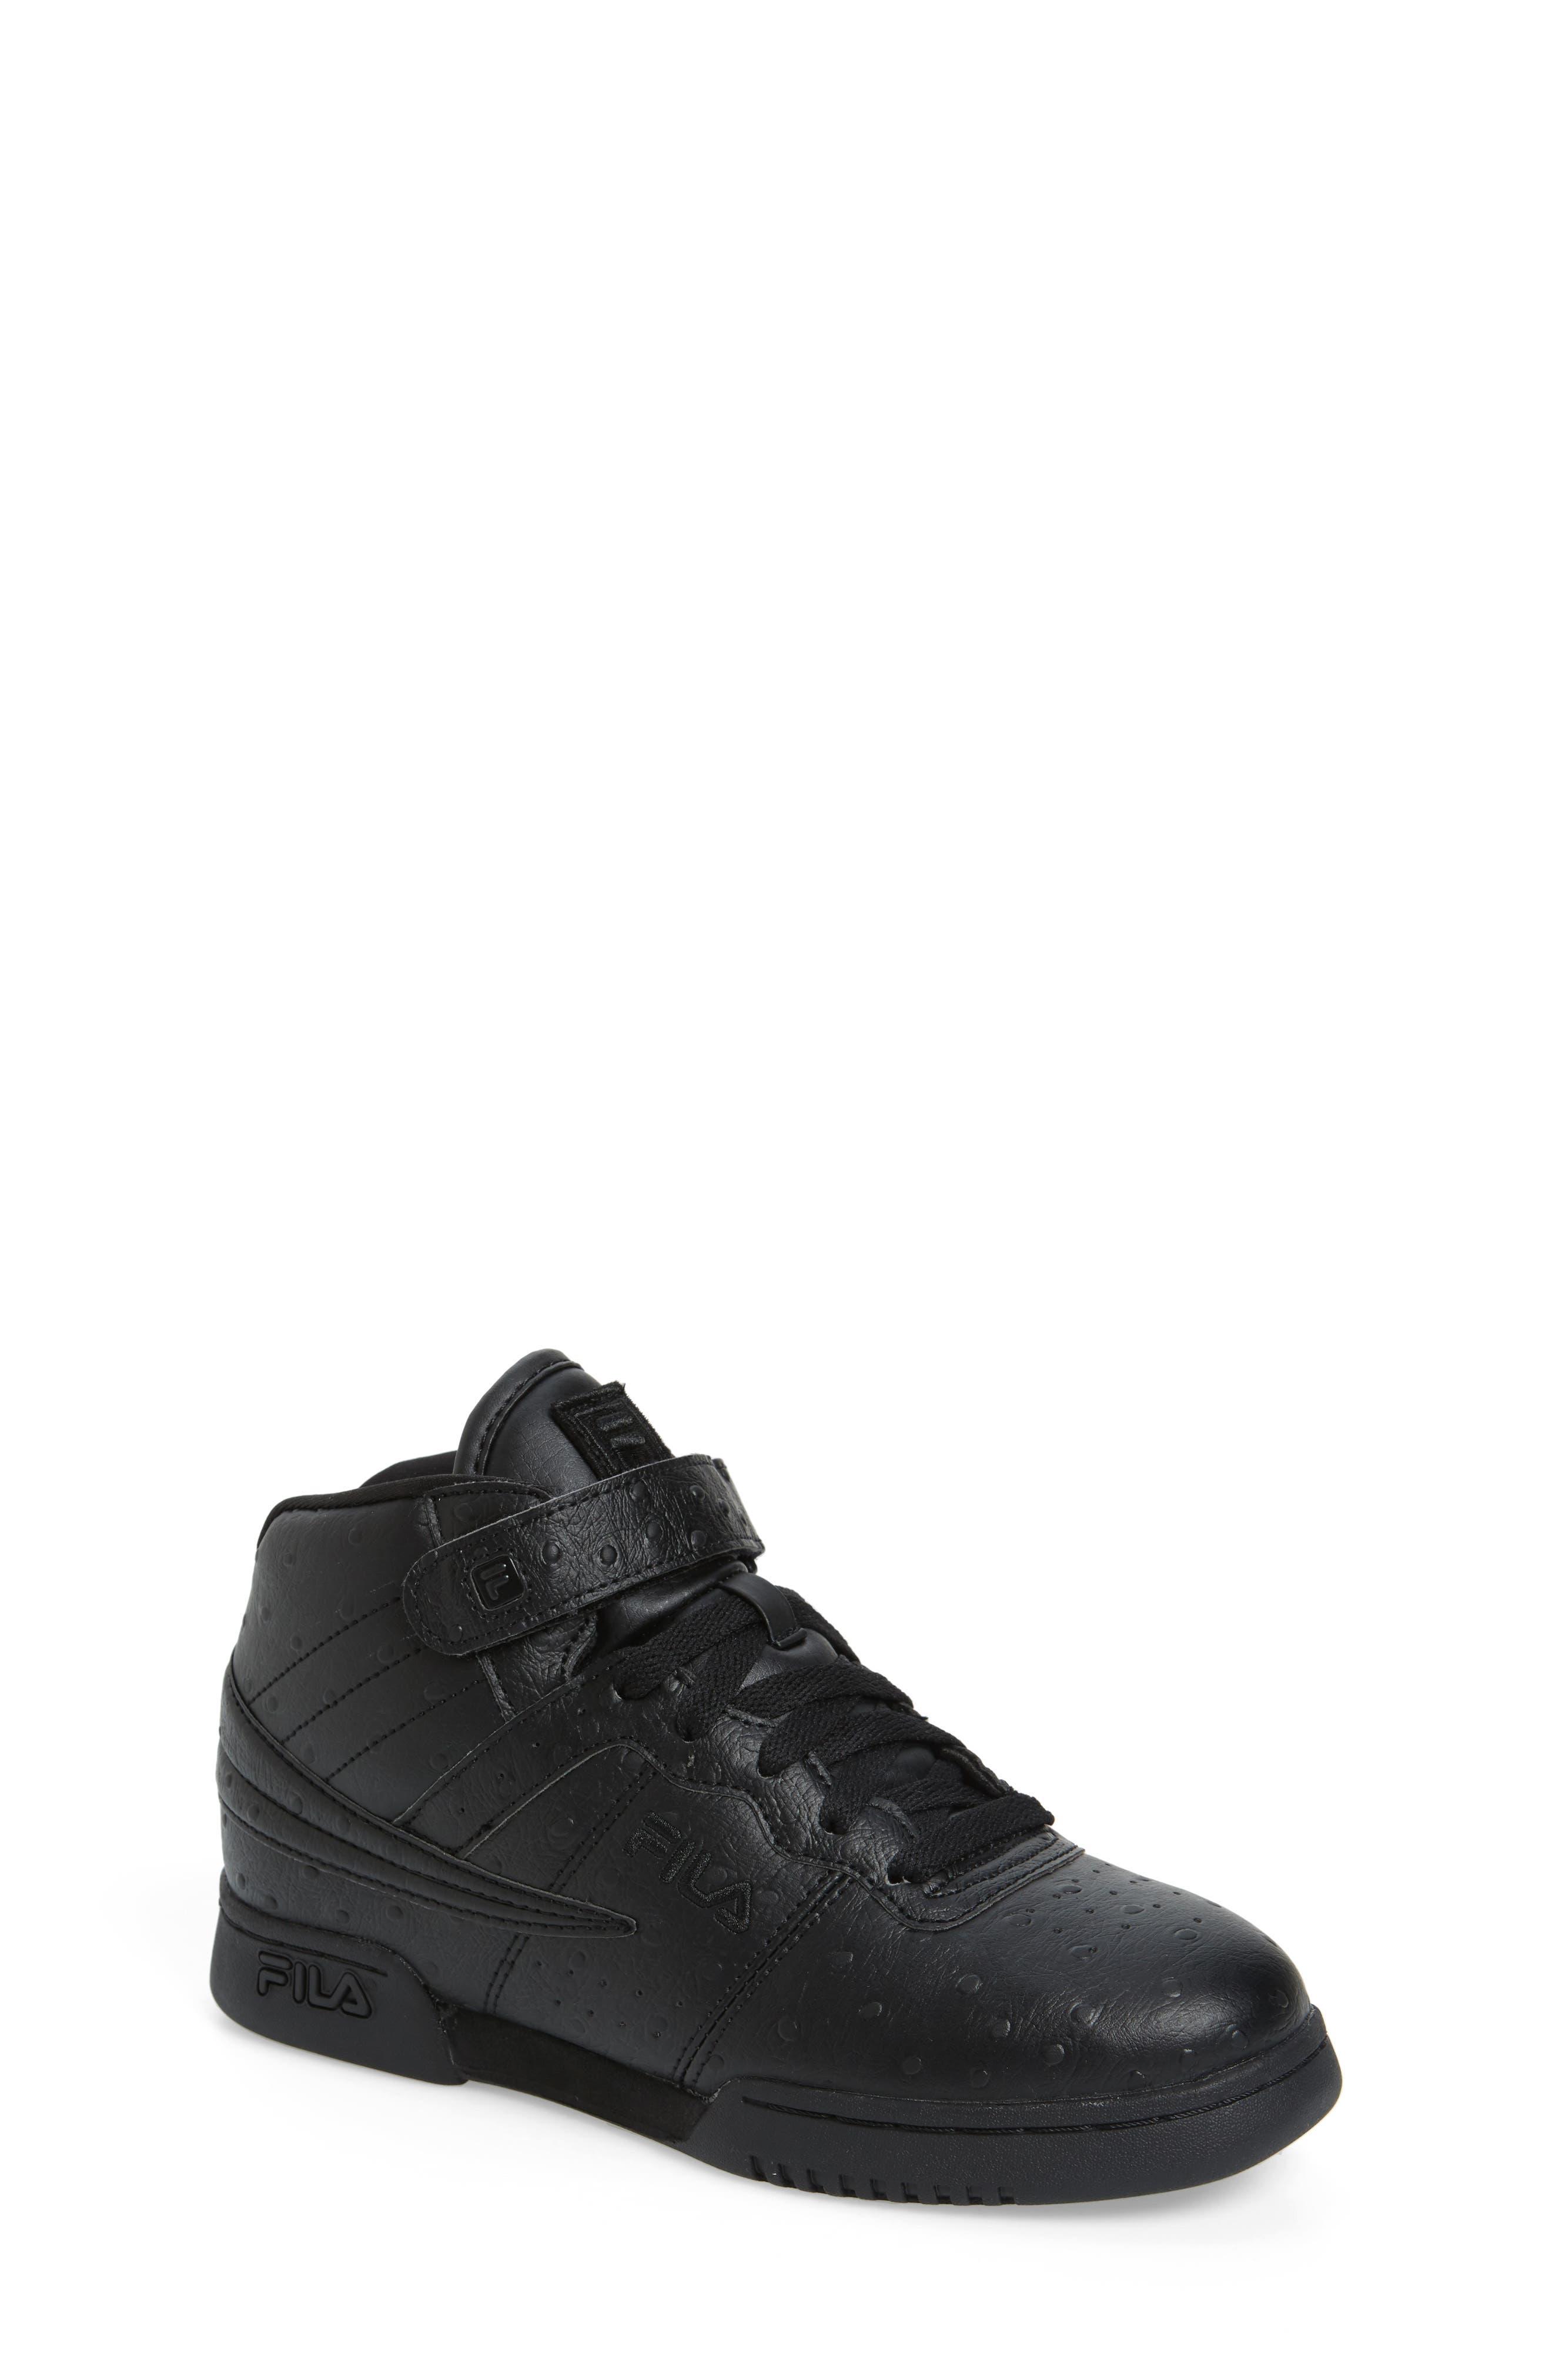 FILA, F-13 Ostrich Embossed High Top Sneaker, Main thumbnail 1, color, TRIPLE BLACK